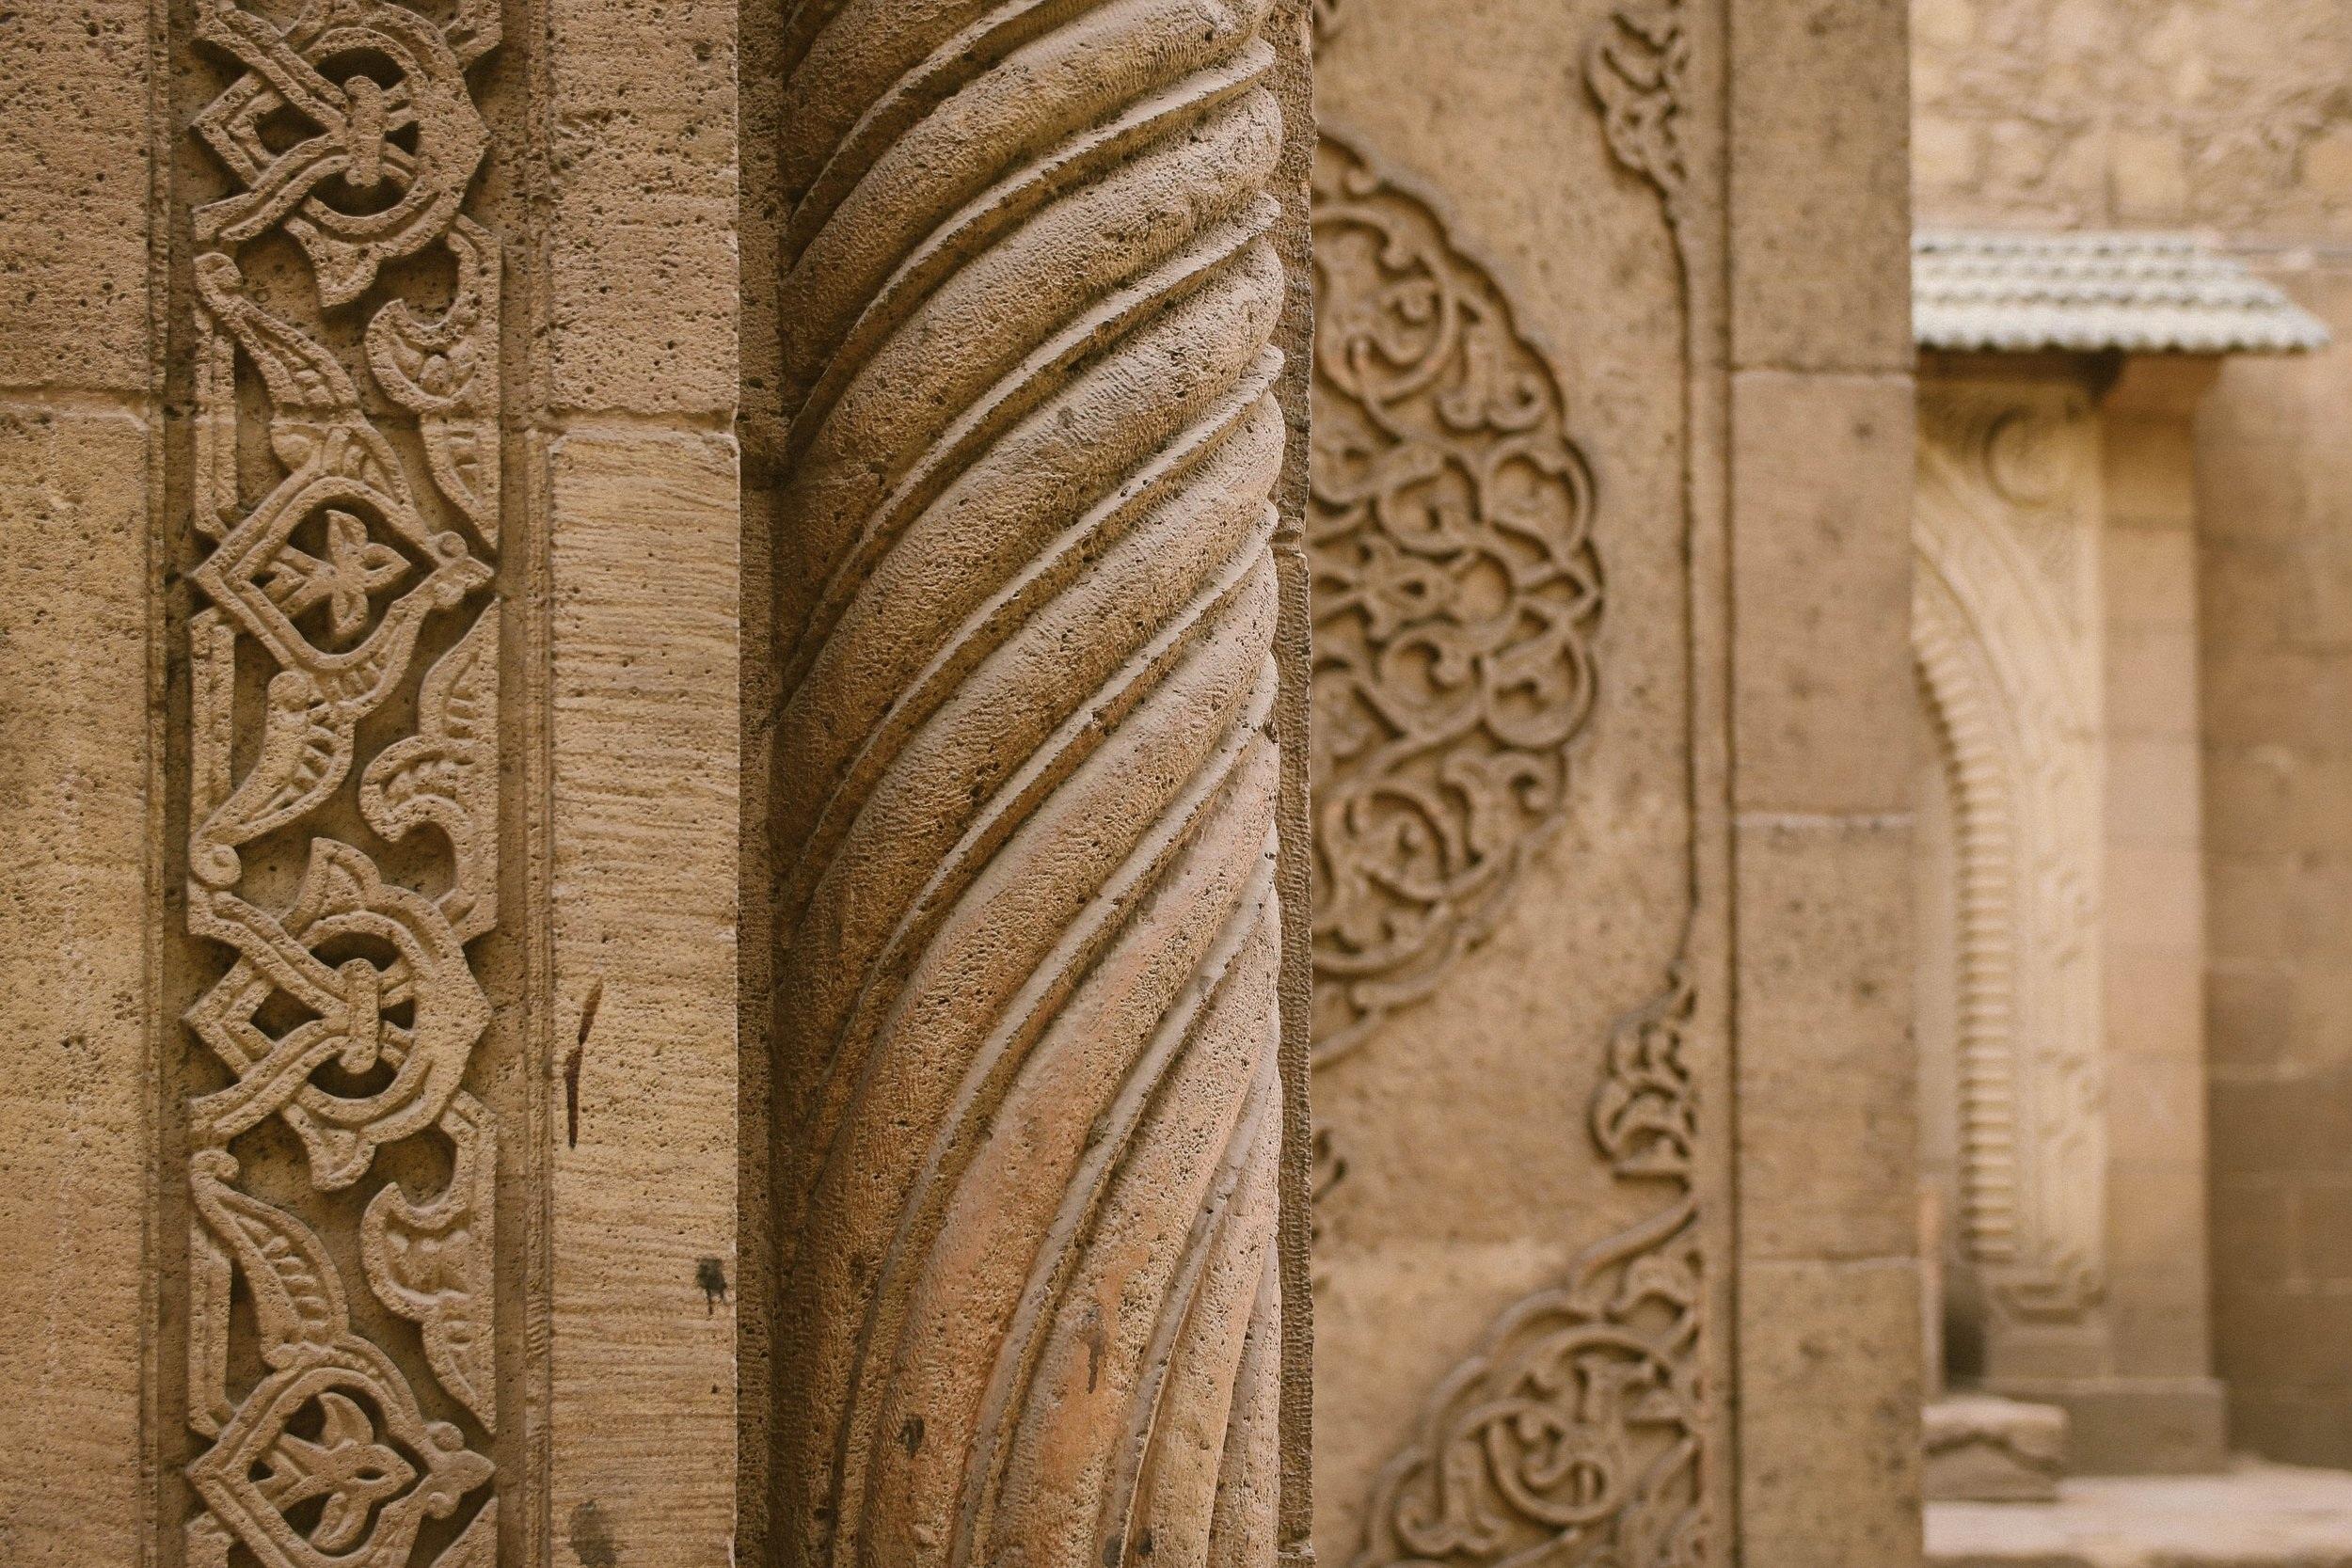 ancient-antique-architecture-1047277.jpg